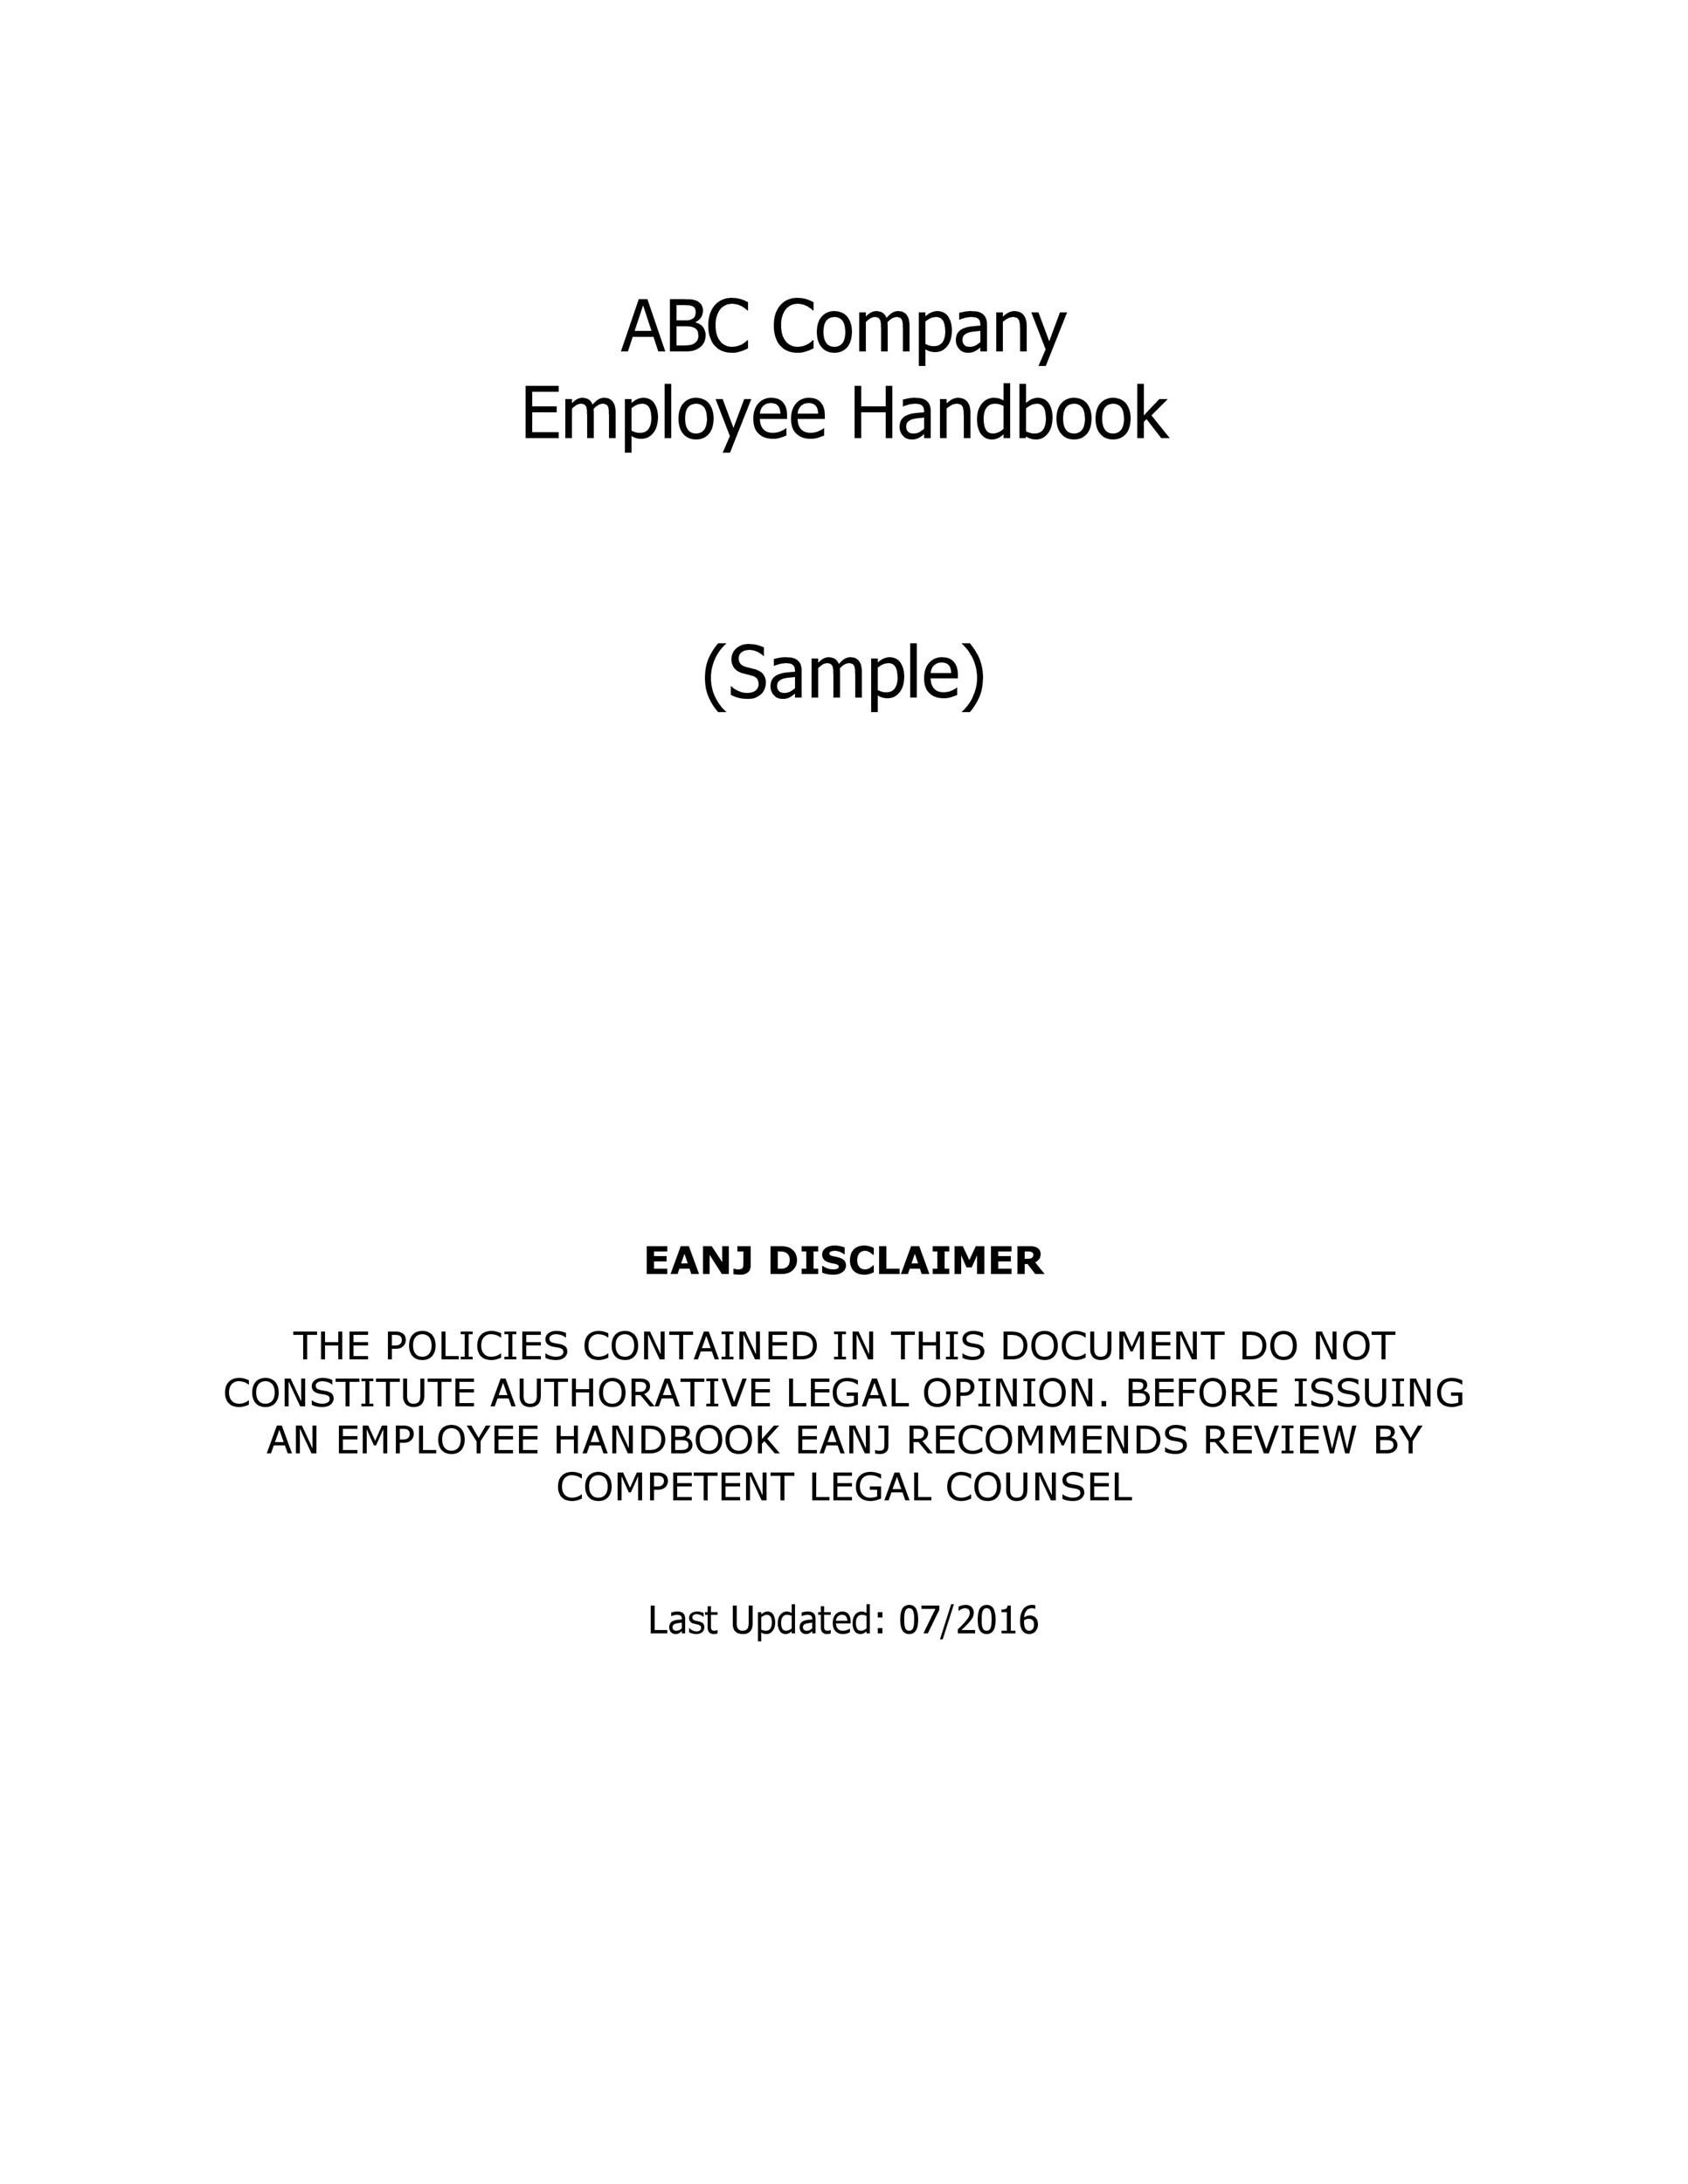 Free employee handbook template 30